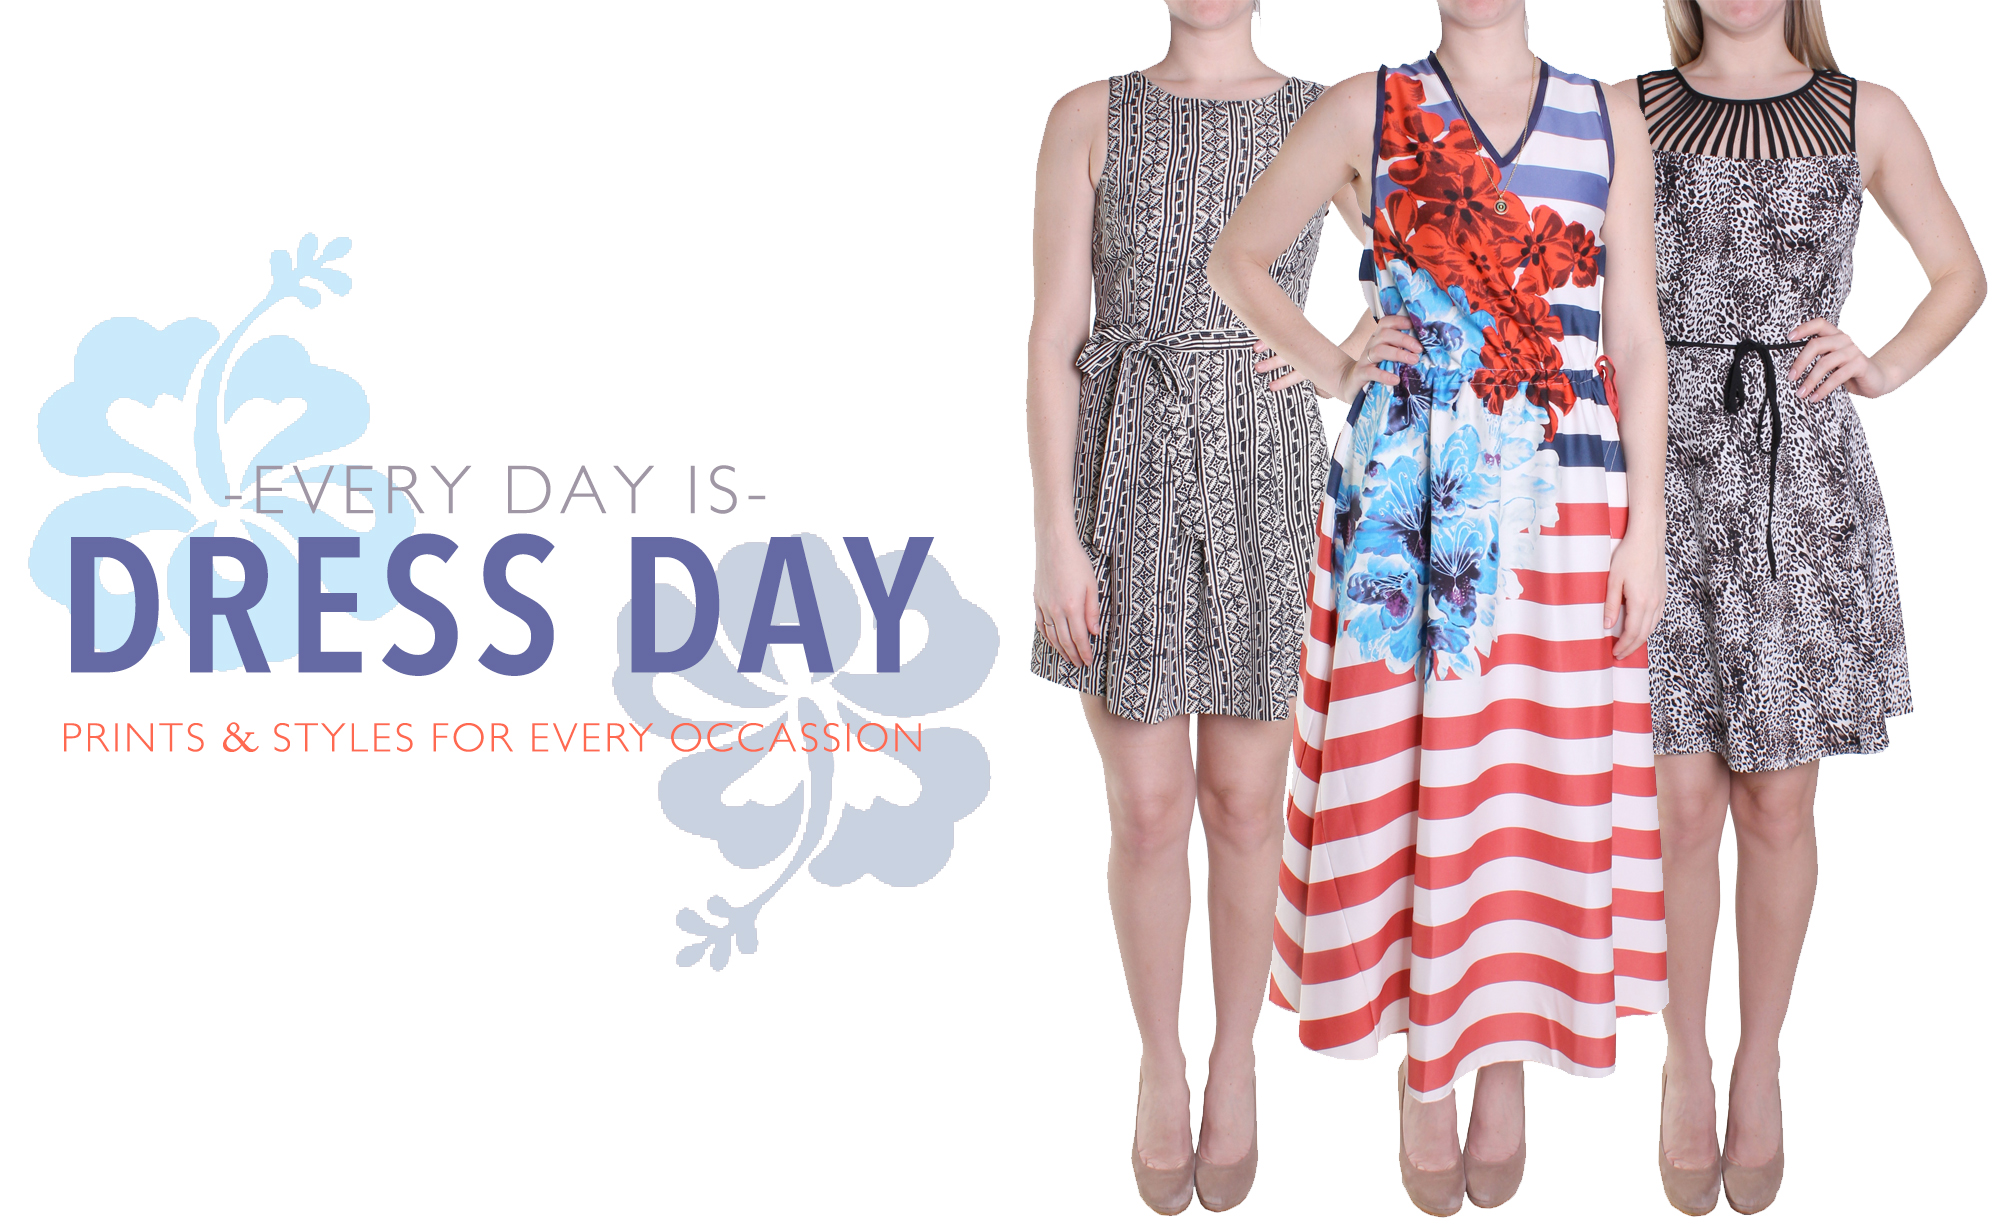 dressday.jpg